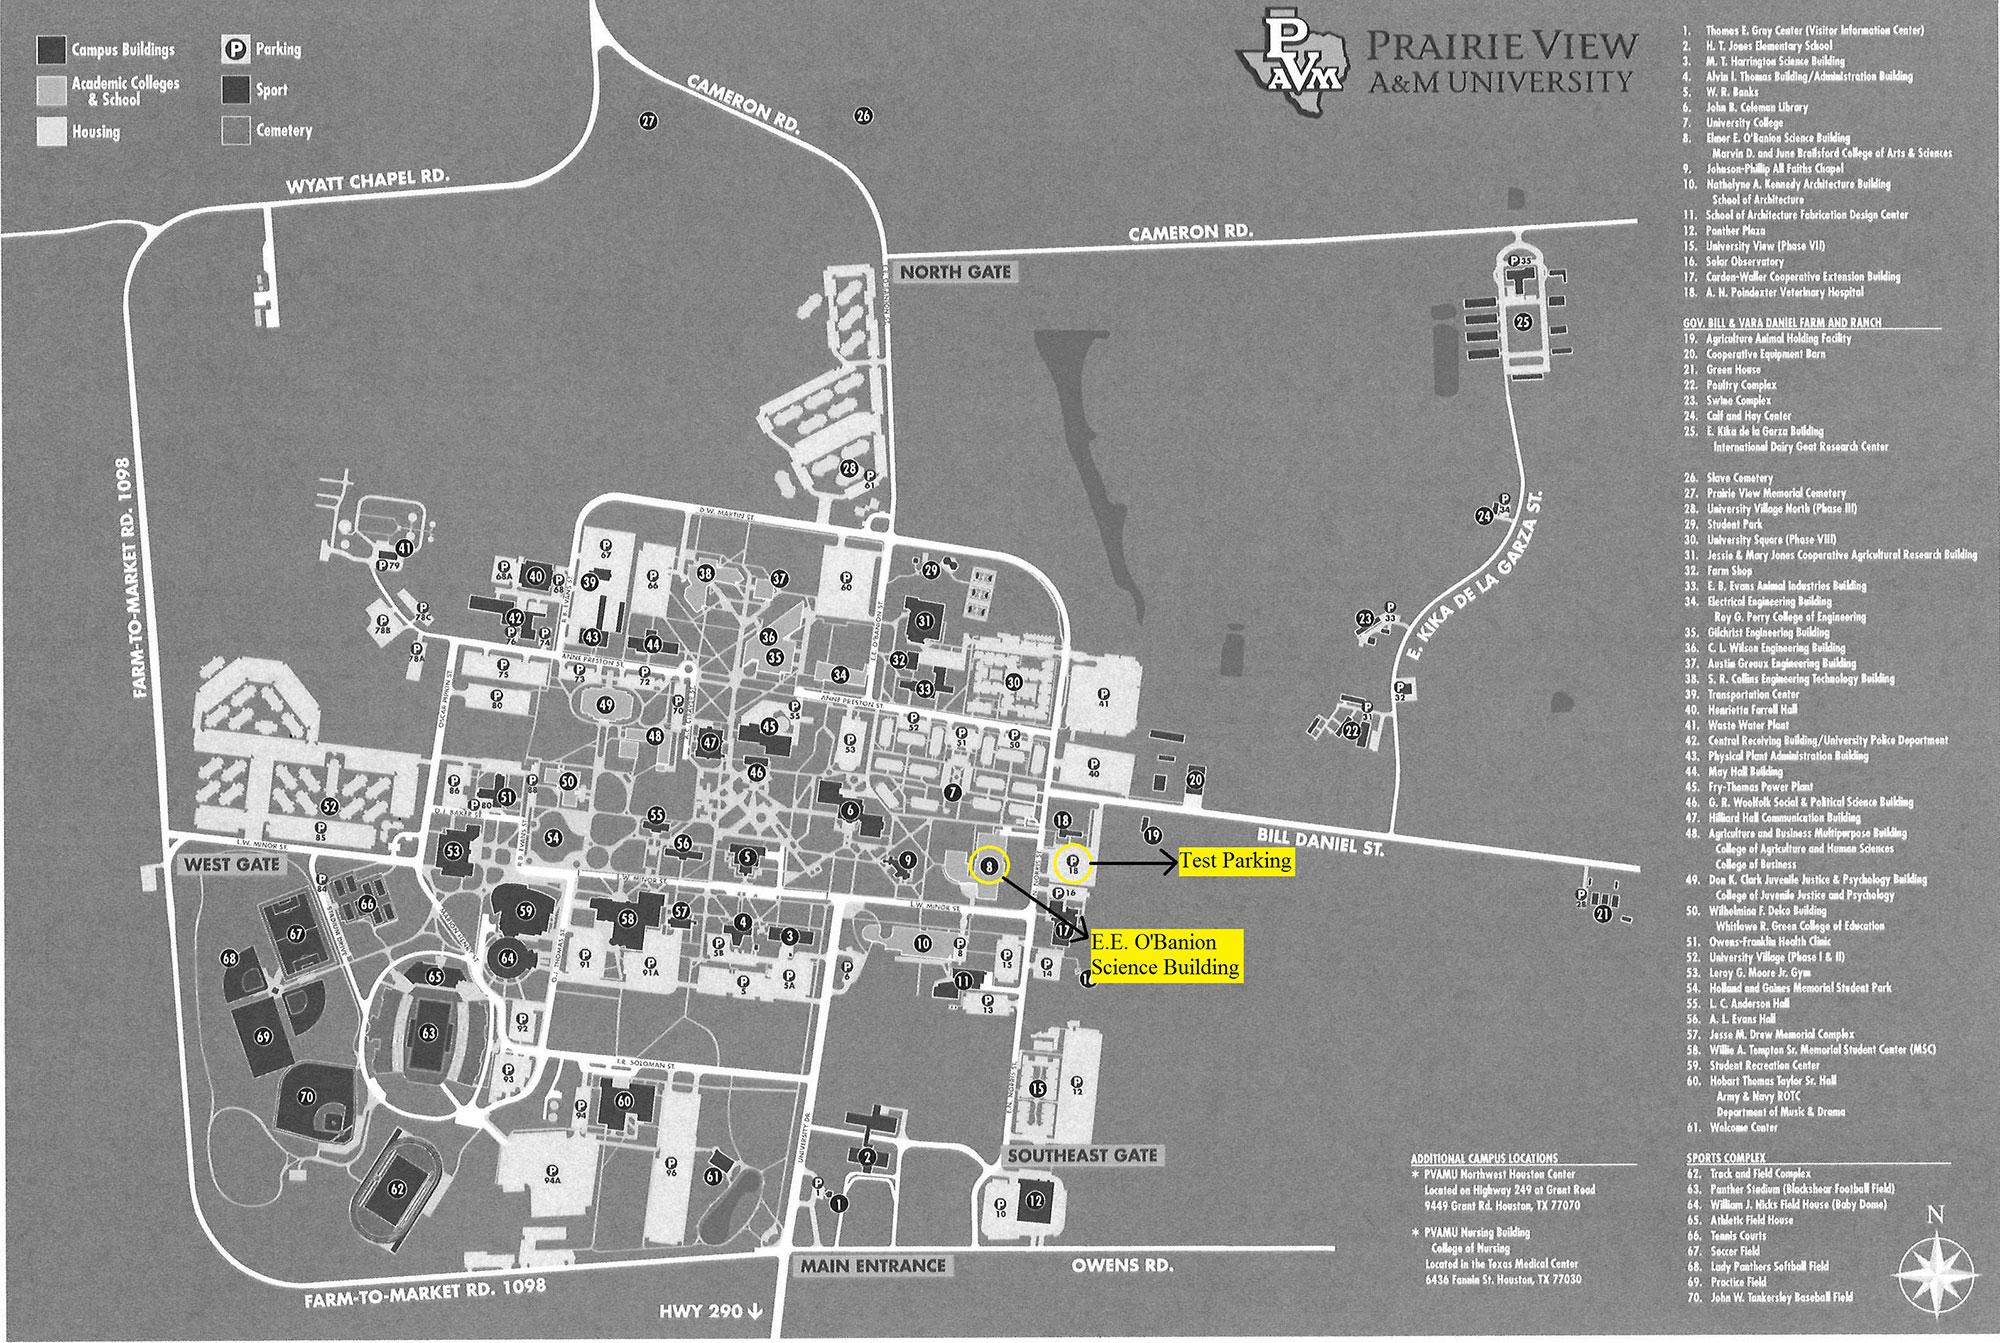 Pvamu Campus Map